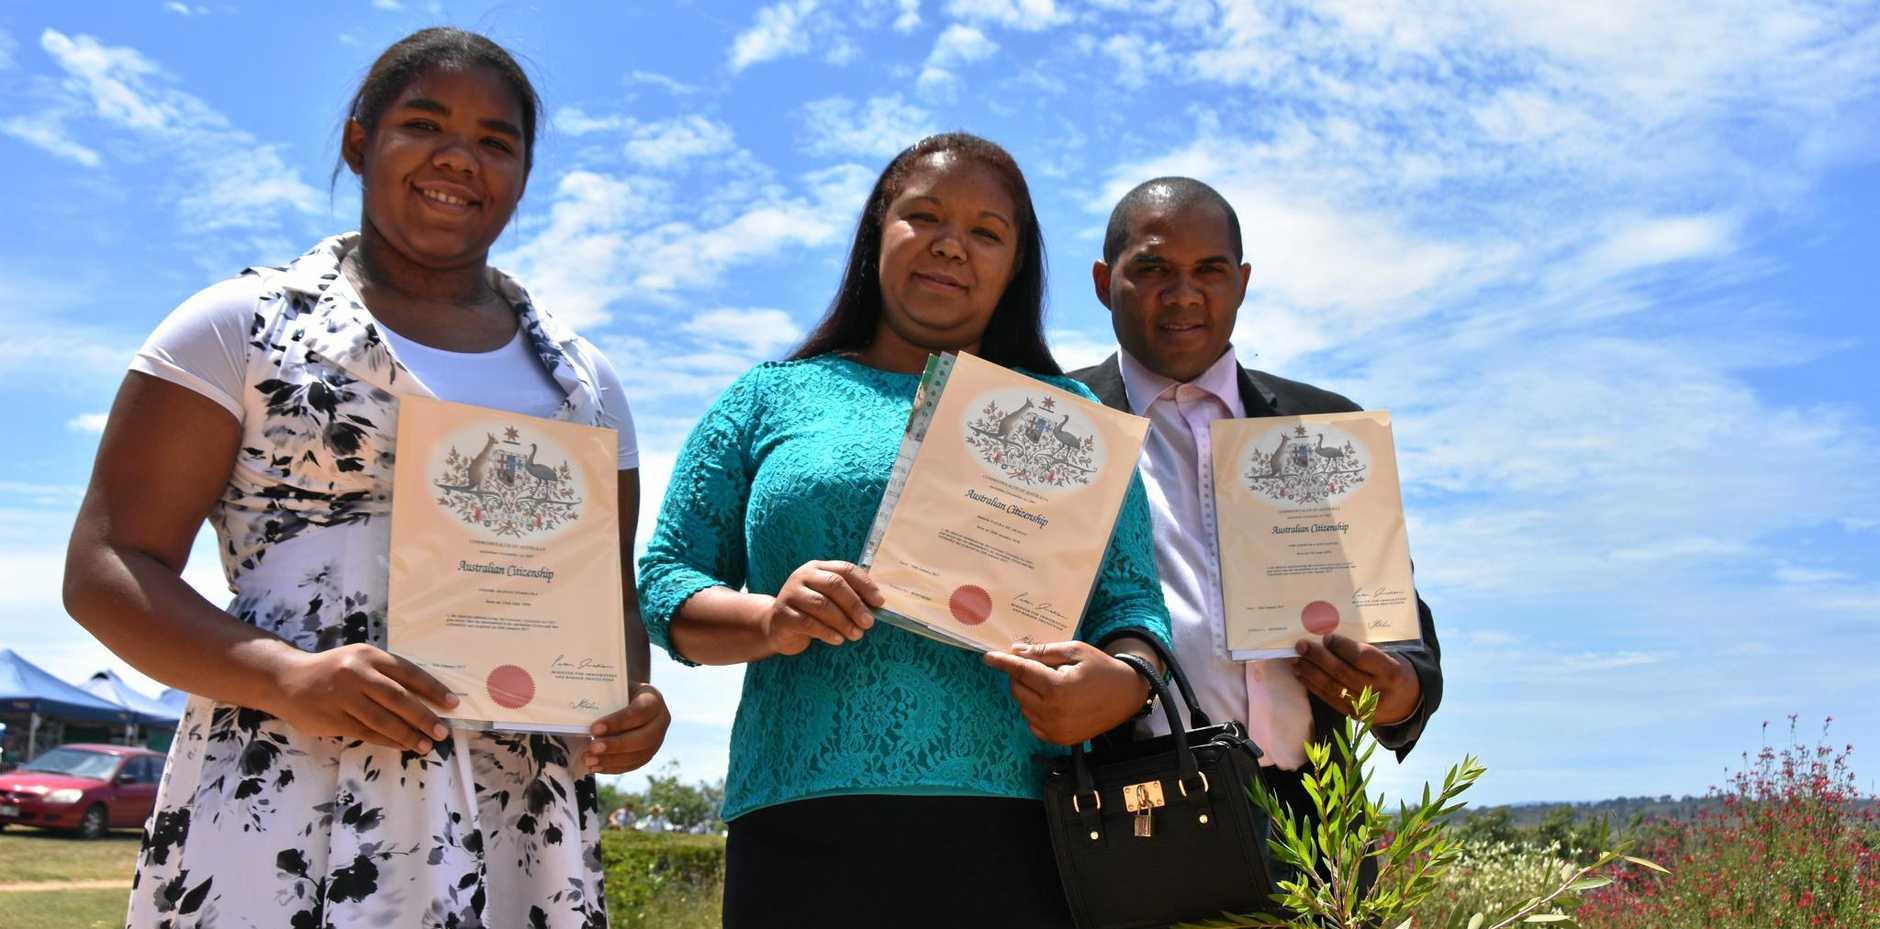 PROUD MOMENT: Eduarda Aranja Ferreira, Daniela Viera de Araujo and Joao Dossantos celebrated their first Australia Day as citizens.